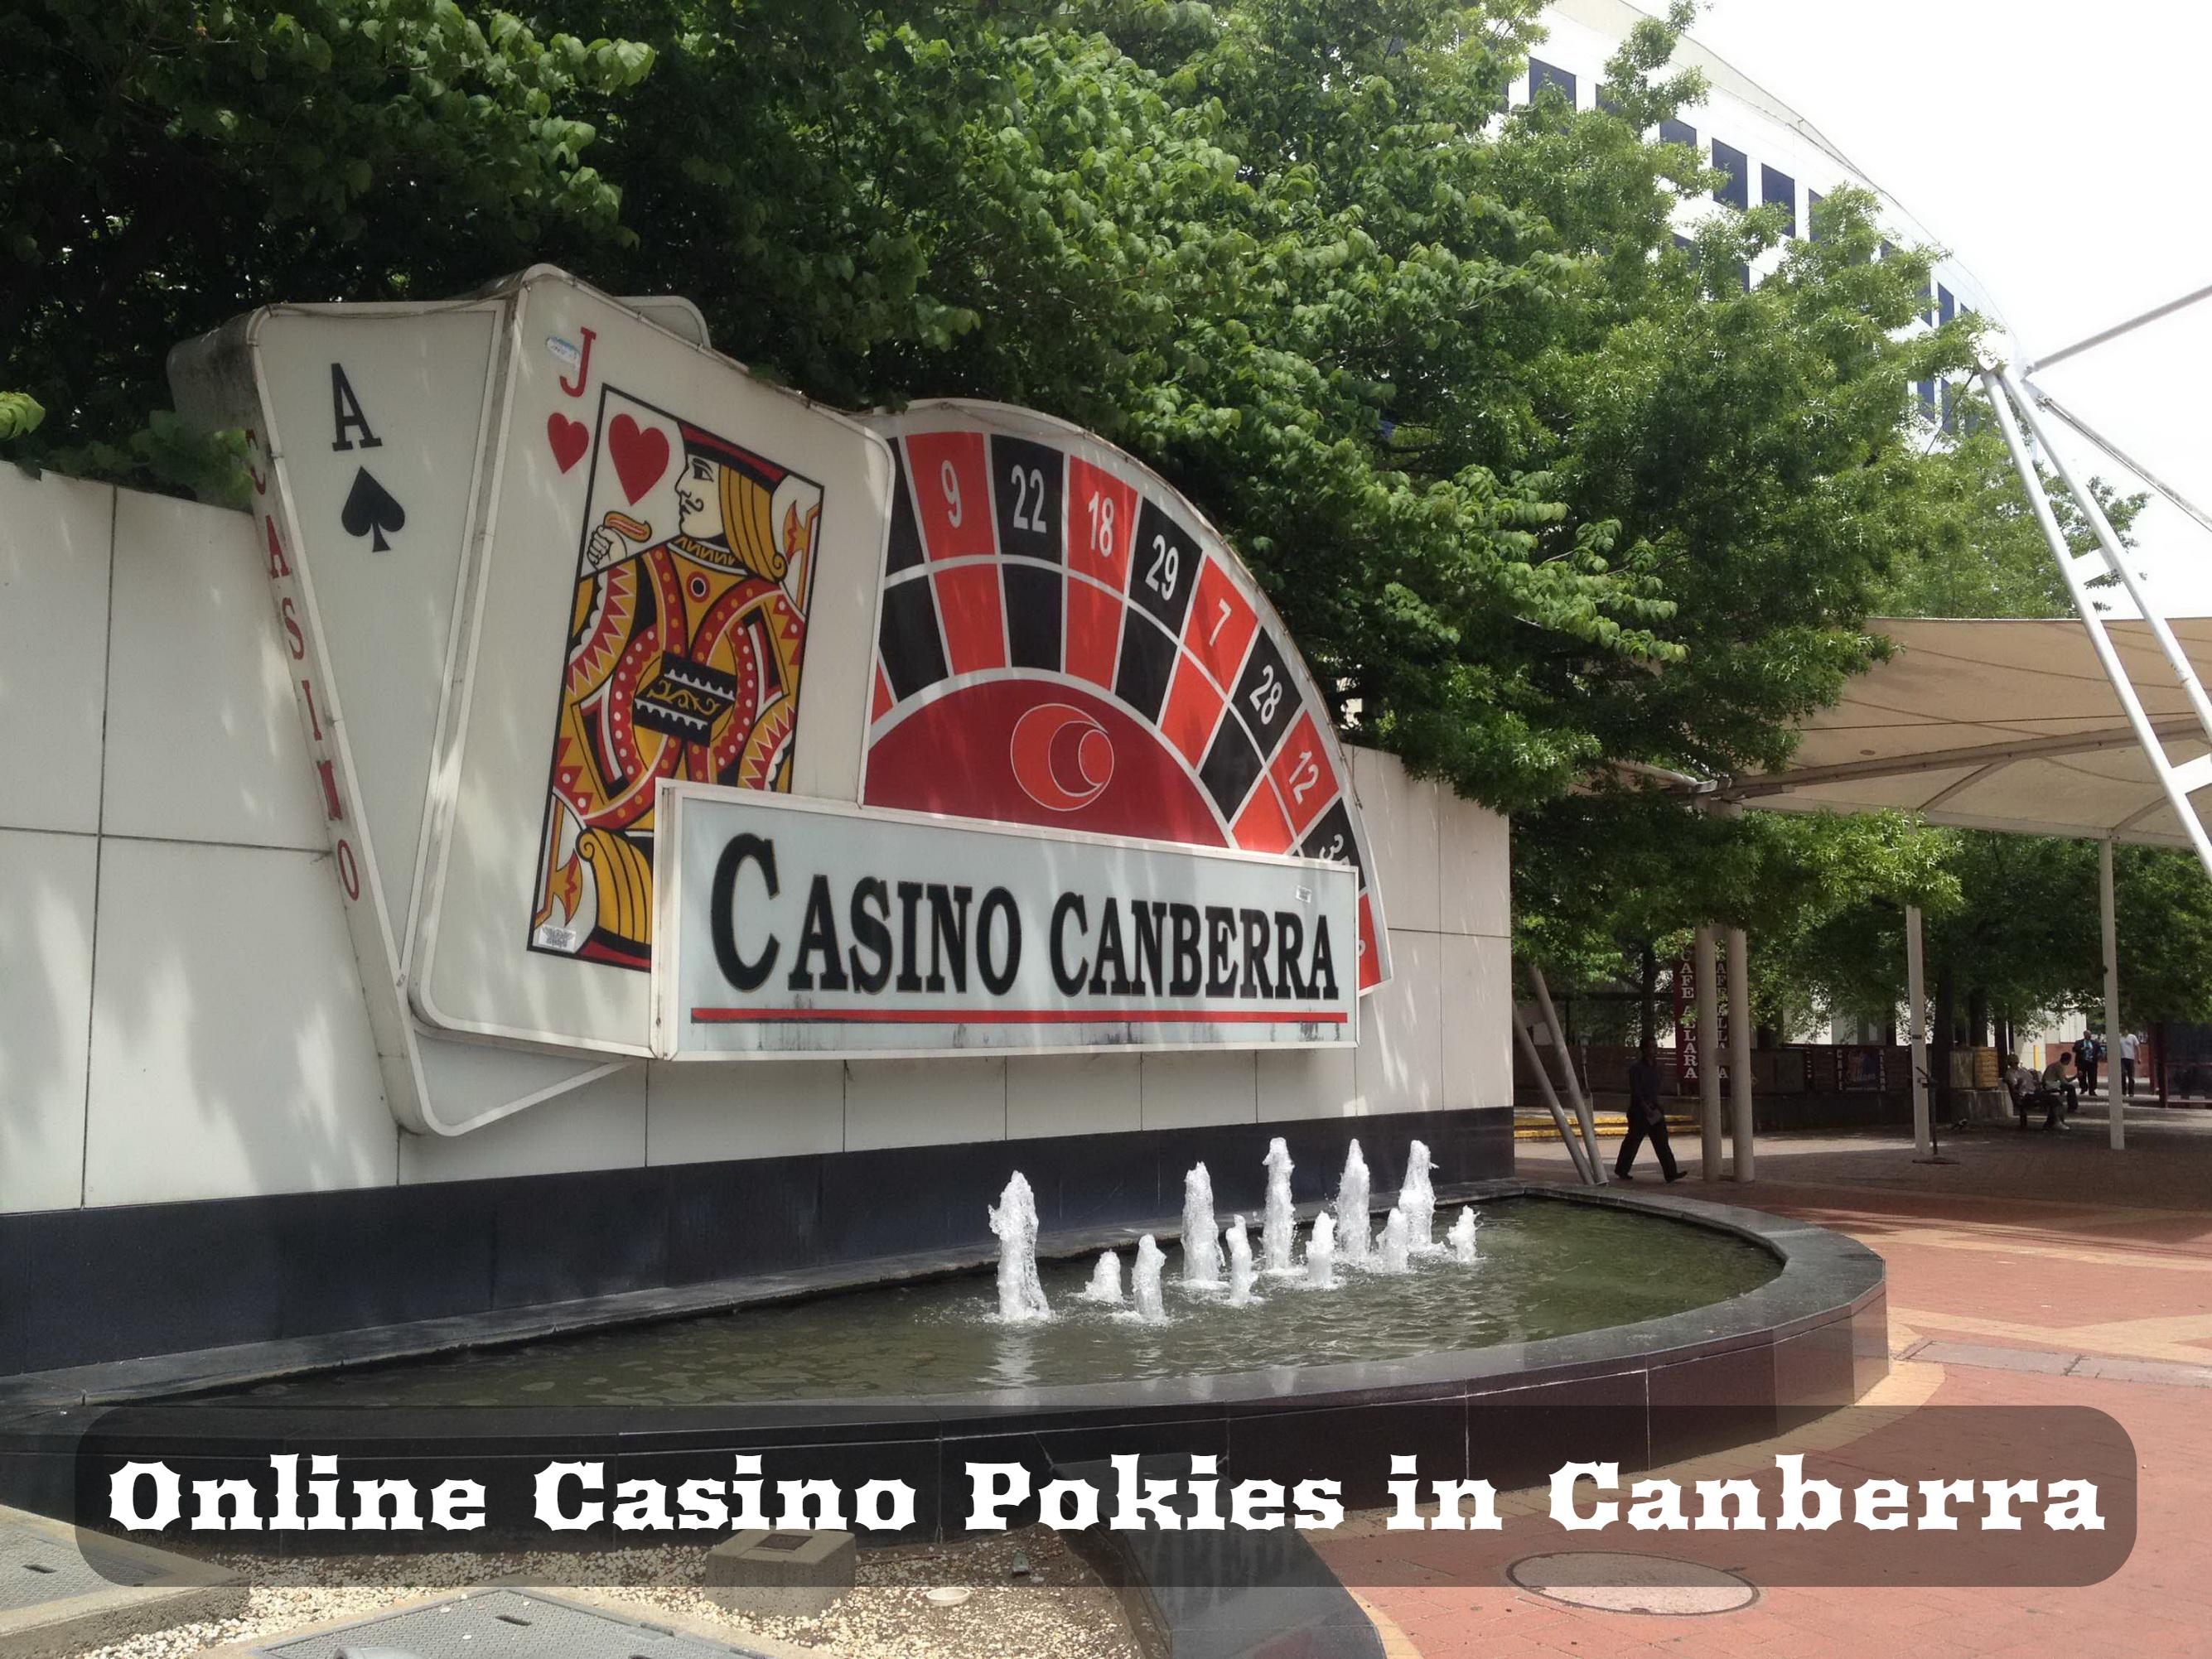 Online Casino Pokies in Canberra